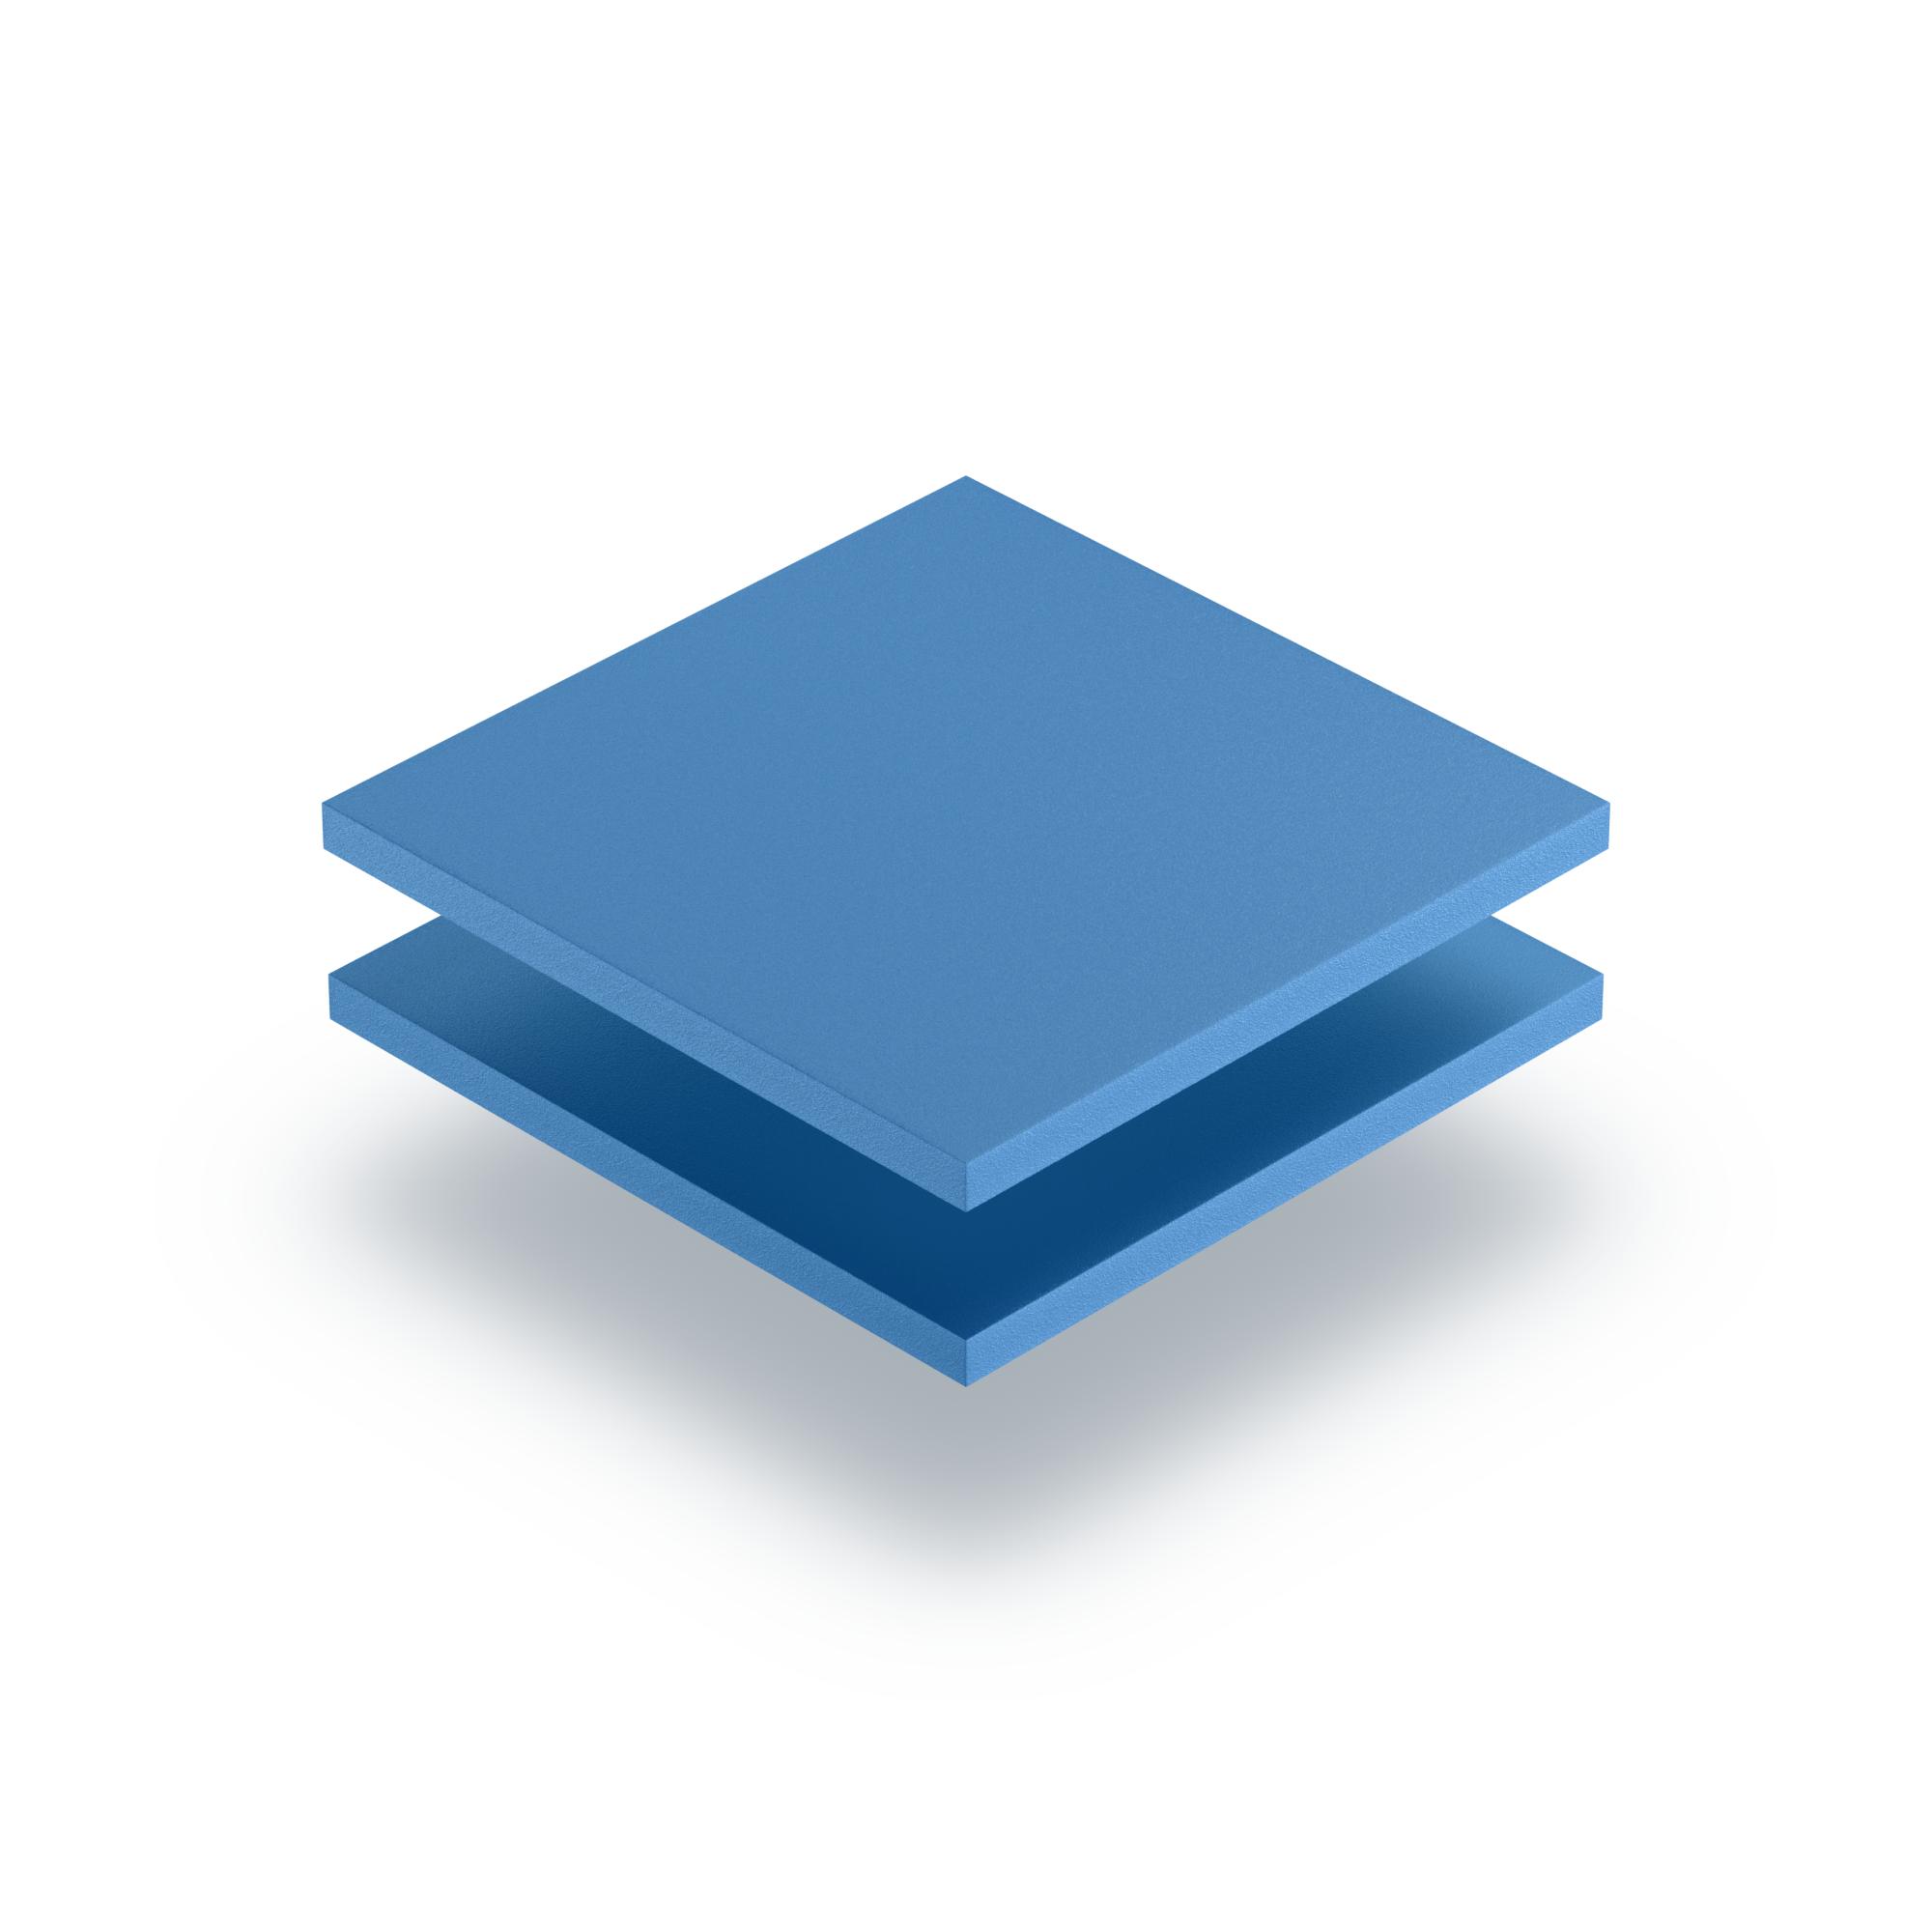 pvc hartschaumplatten hellblau 3 mm zuschnitt nach ma. Black Bedroom Furniture Sets. Home Design Ideas